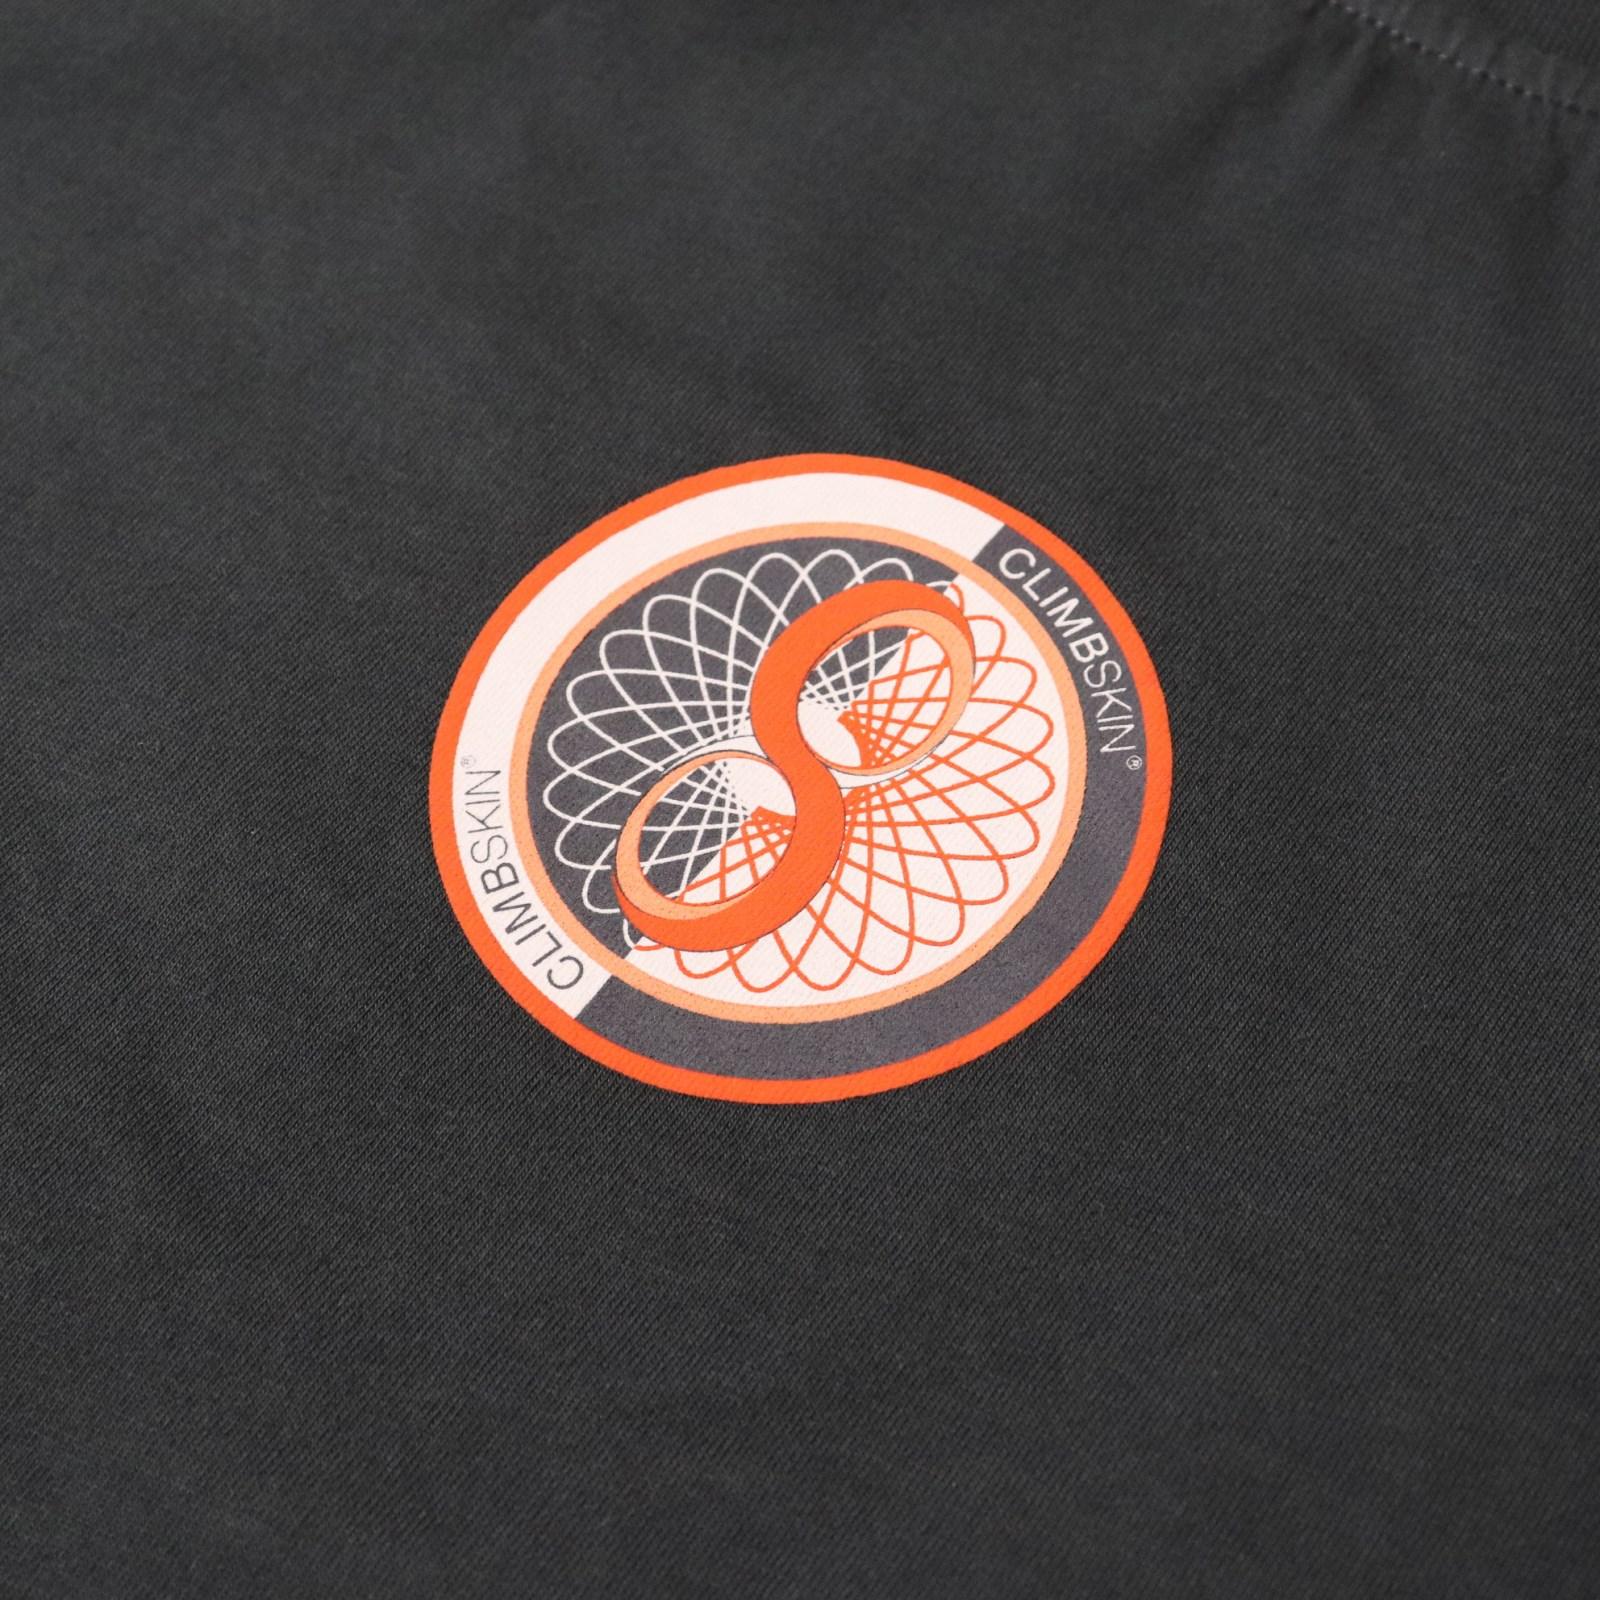 CLIMB SKIN クライムスキン ロゴTシャツ